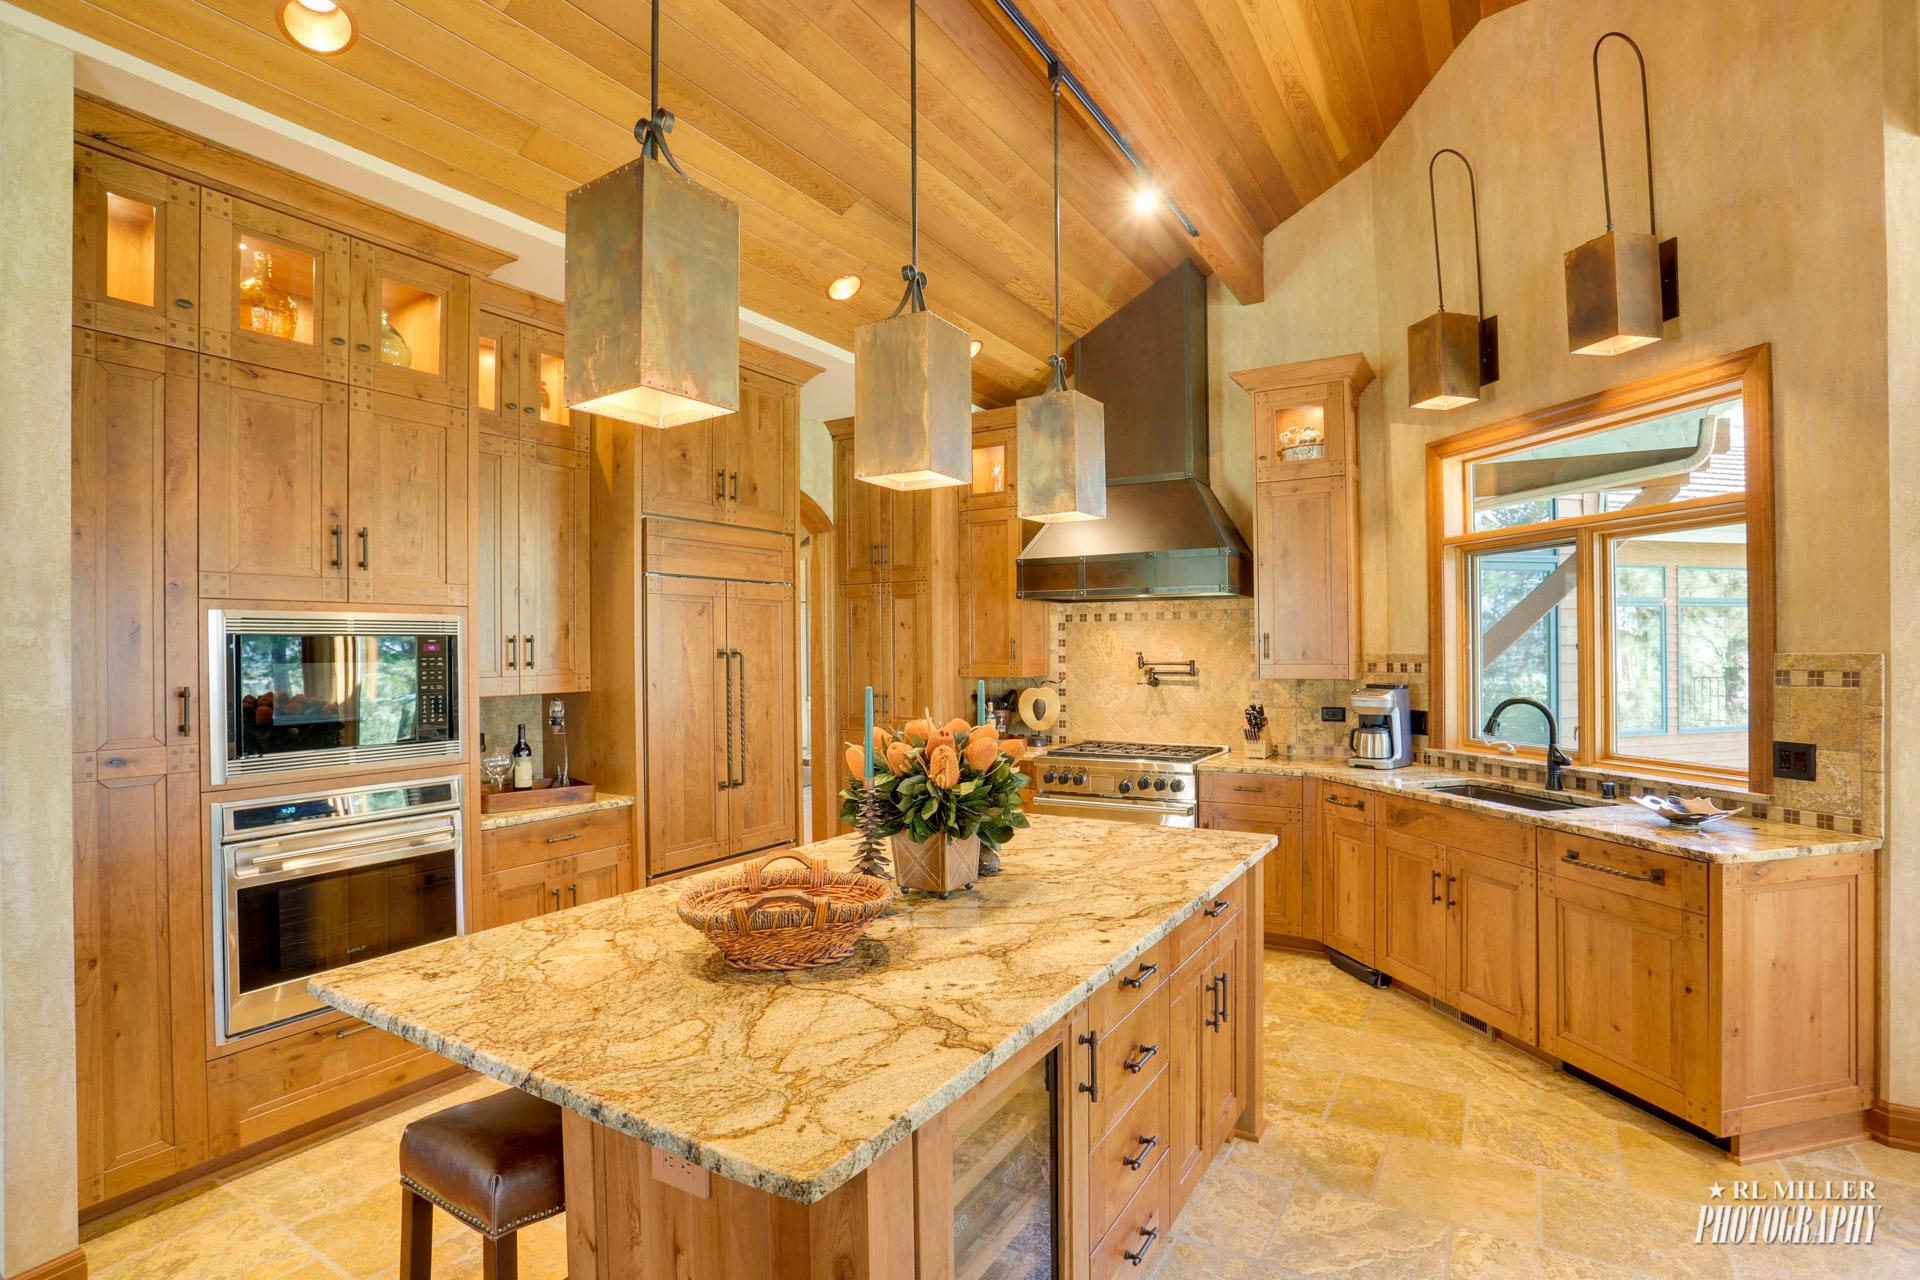 Spokane Architectural Photography